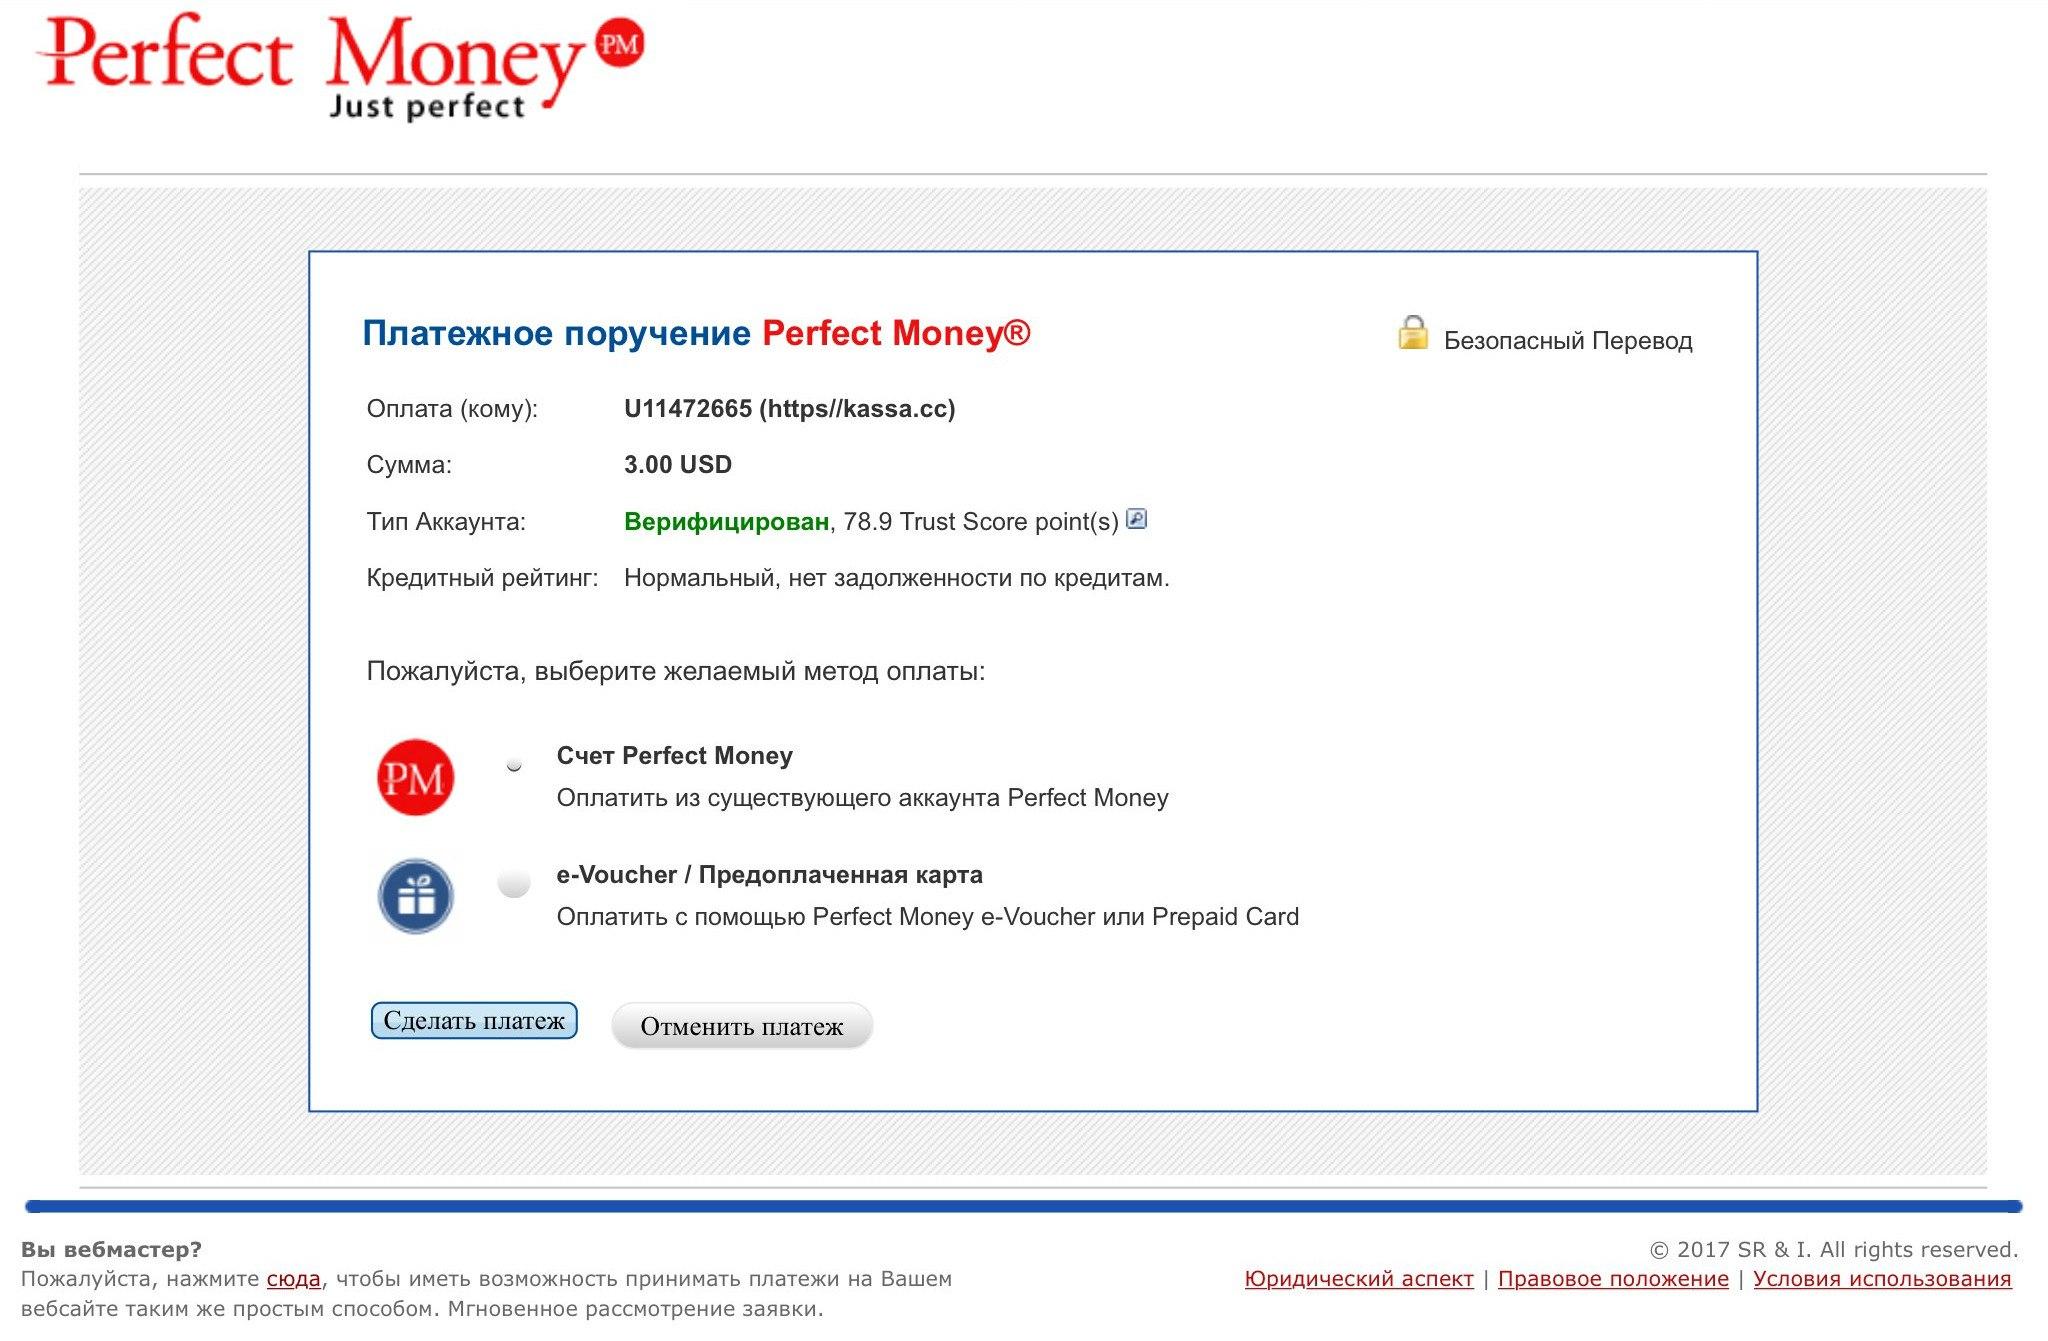 Kassa.cc - единый обмен валюты. Вывод Perfect Money USD на карту Visa/MasterCard RUB